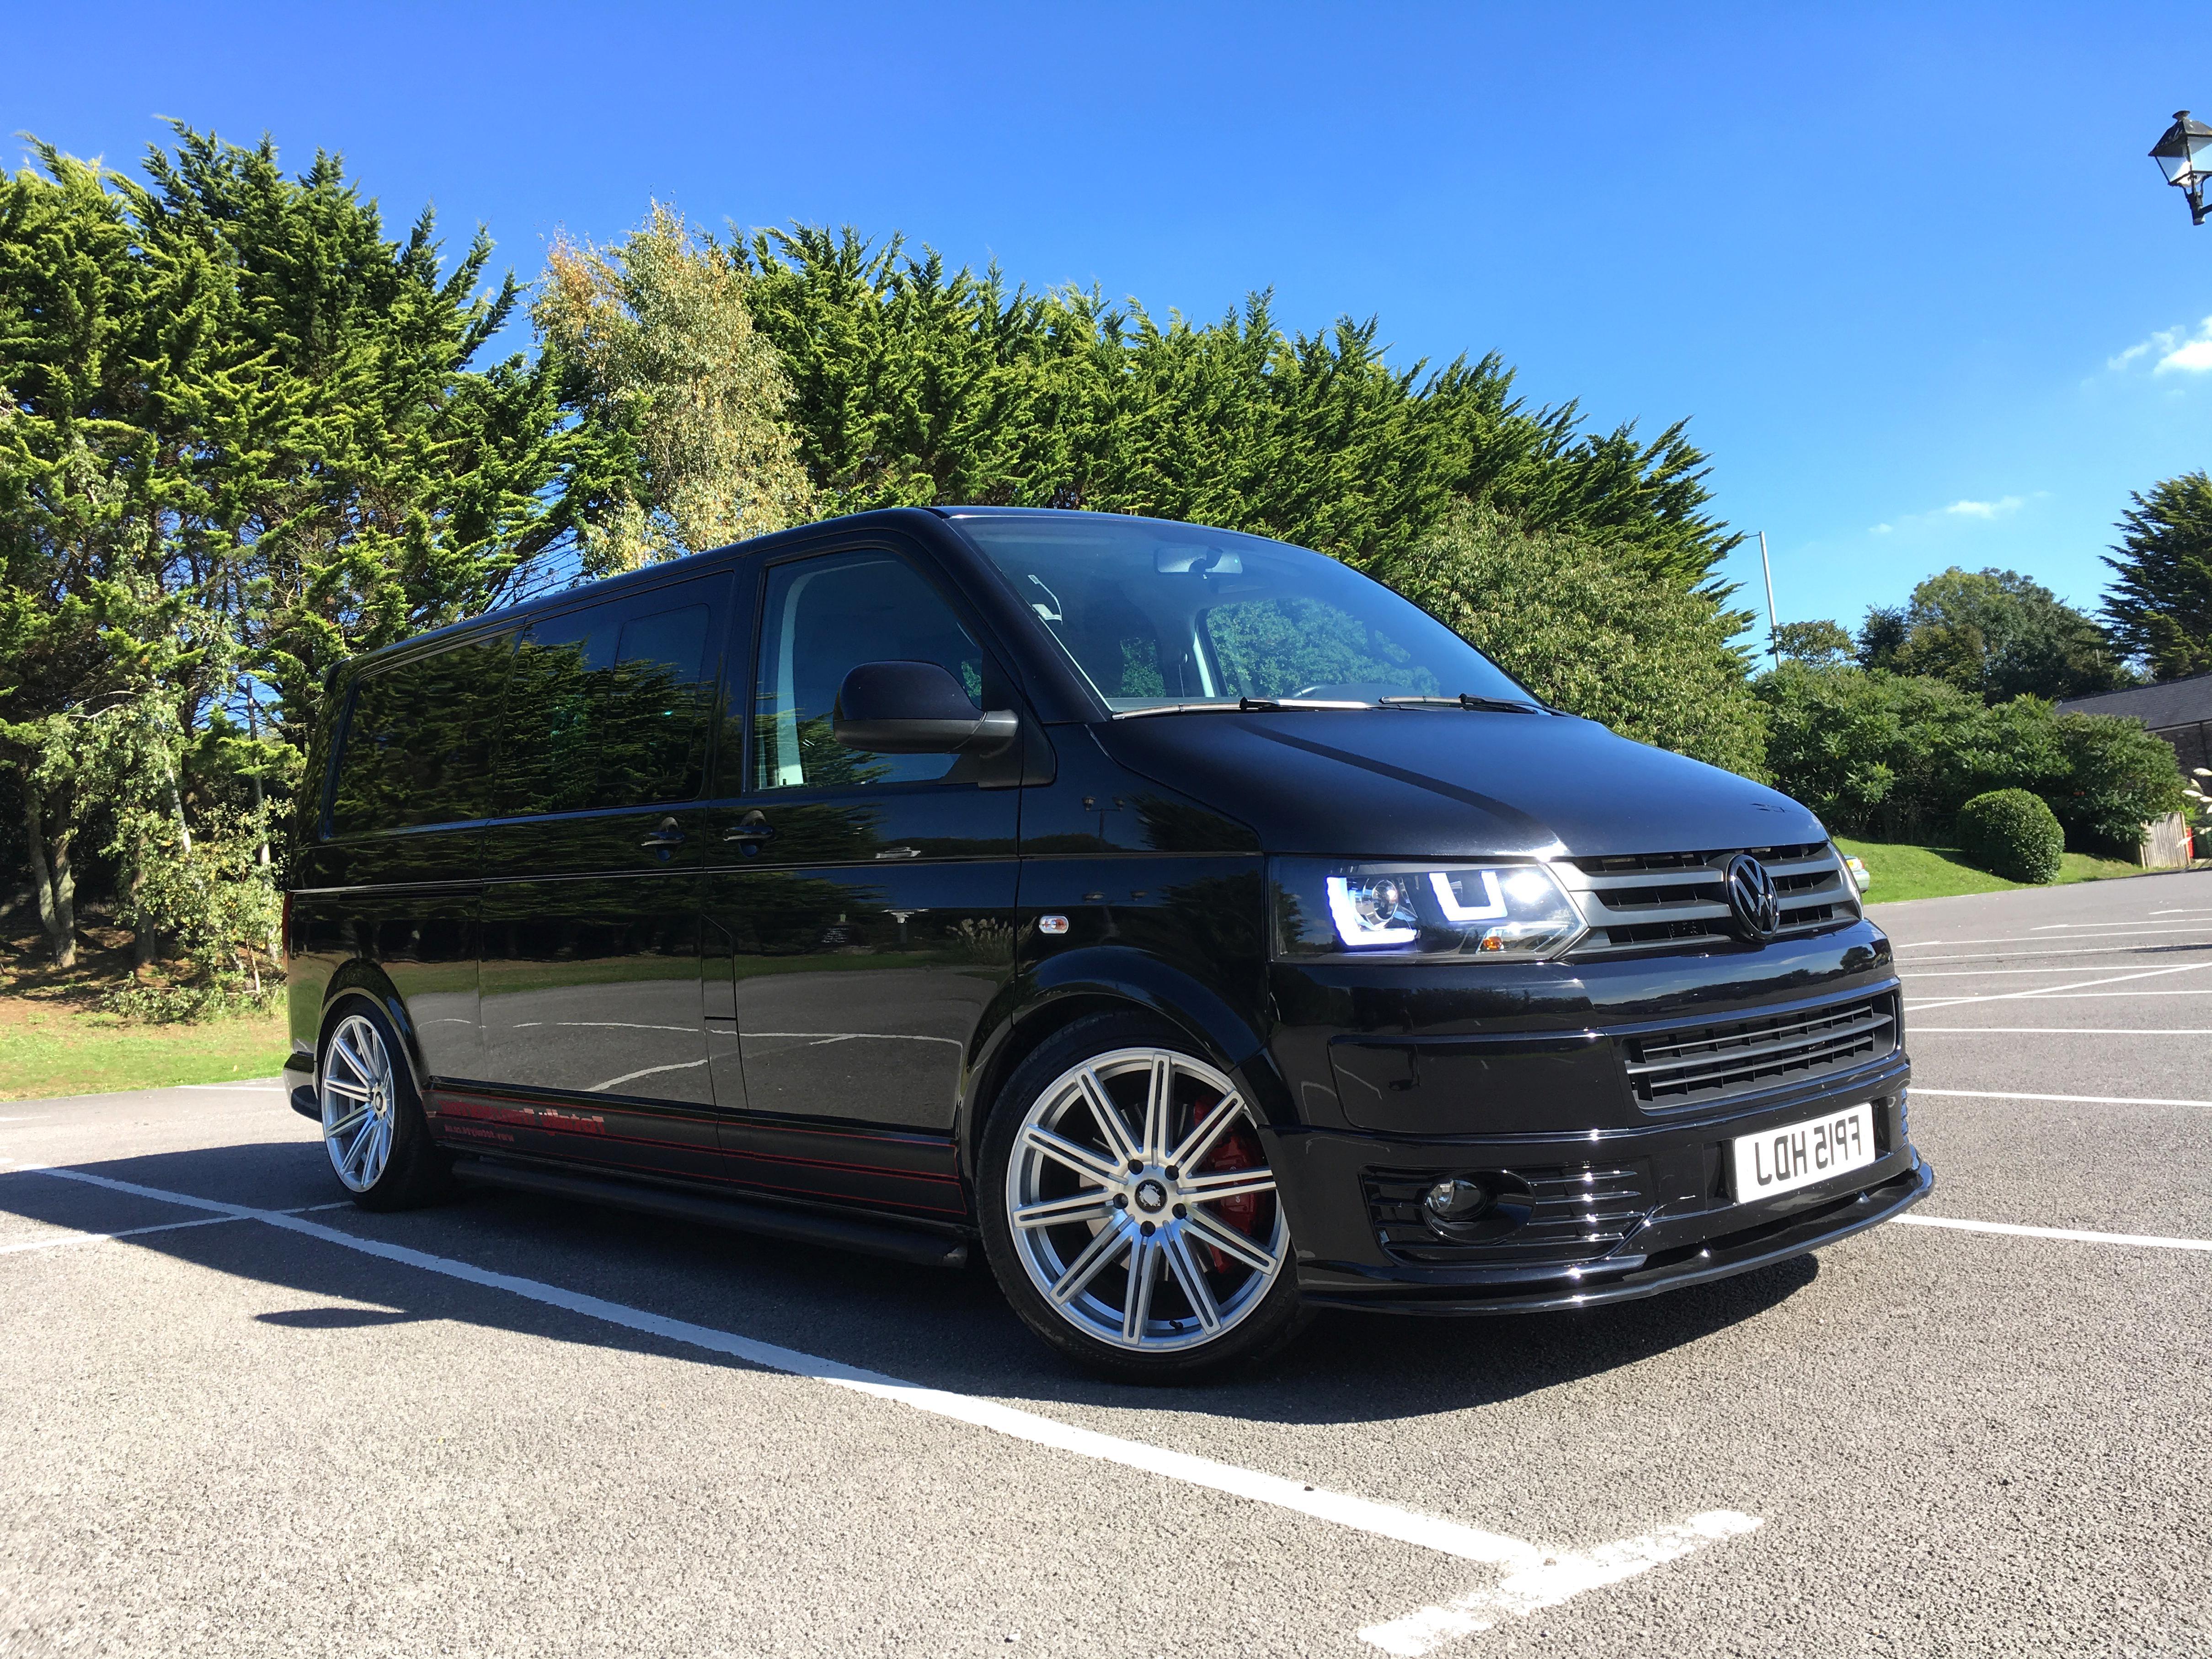 vw transporter t5 kombi for sale